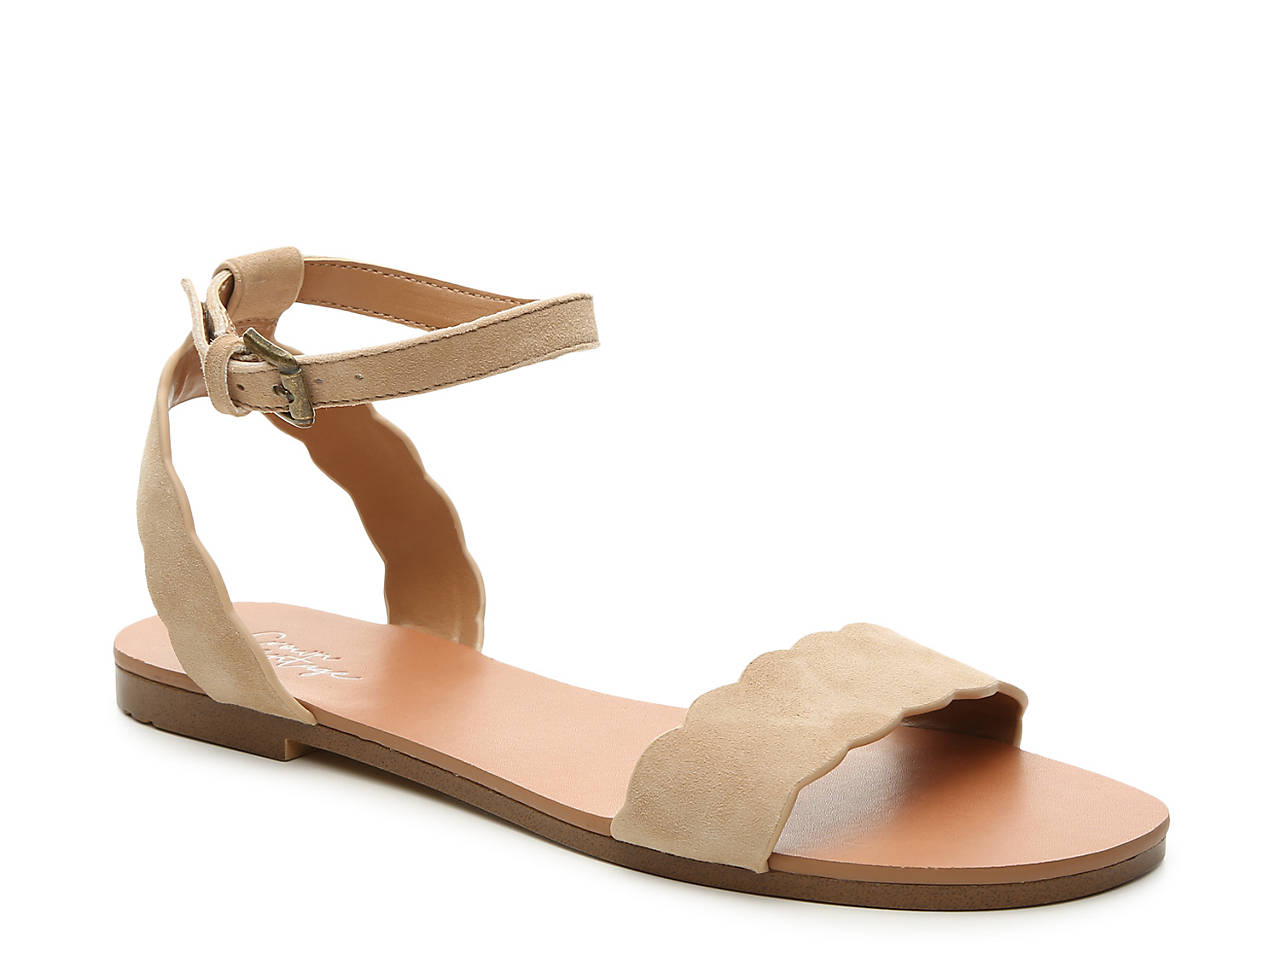 aa9f322b182 Crown Vintage Rayli Flat Sandal Women s Shoes